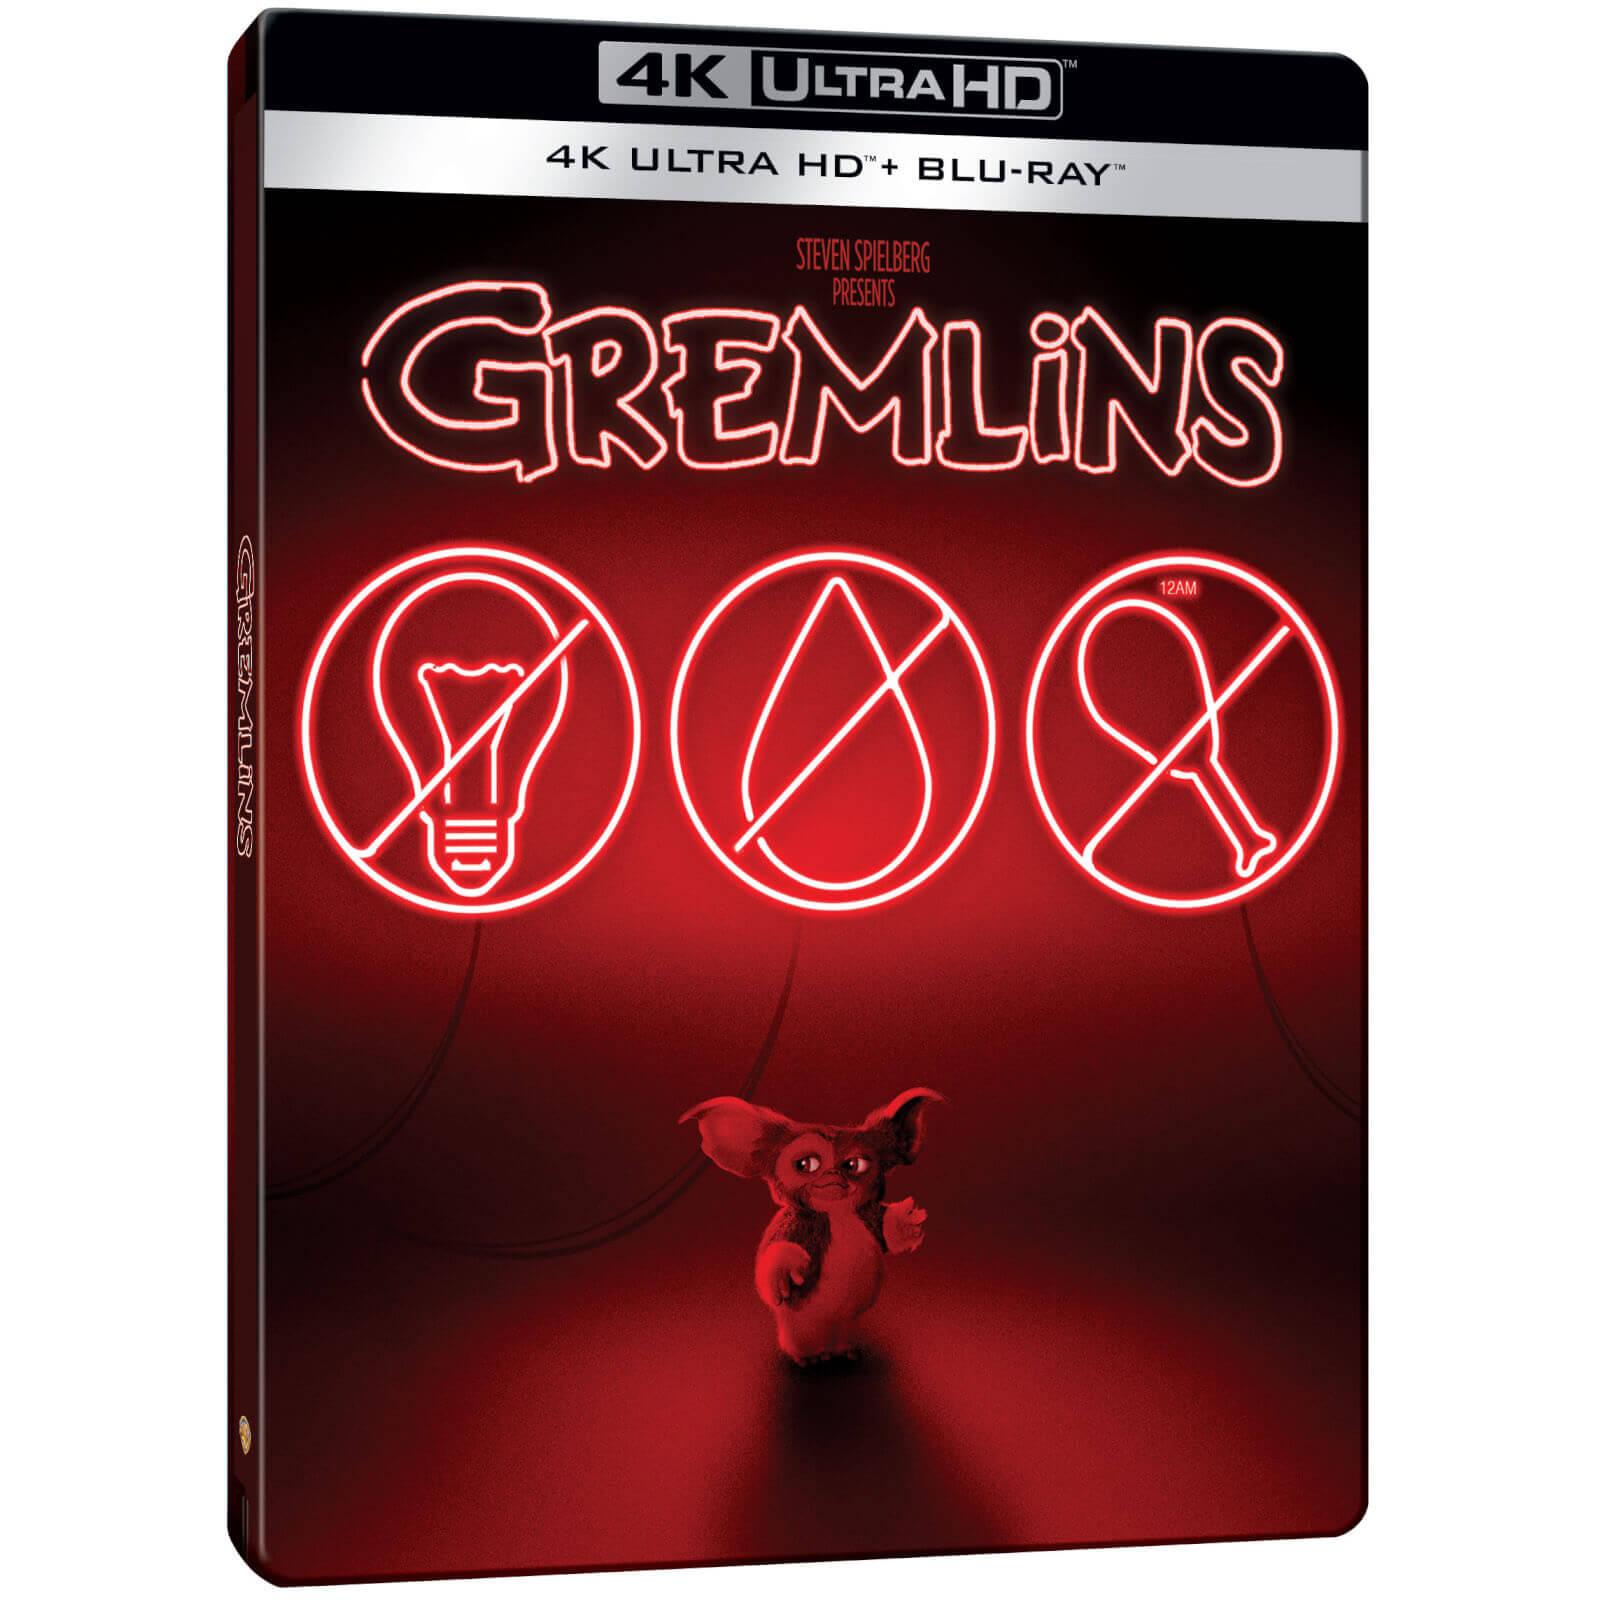 Gremlins - Exklusives Steelbook (4K Blu-ray + Blu-ray) für 18,69€ inkl. Versand (Zavvi)